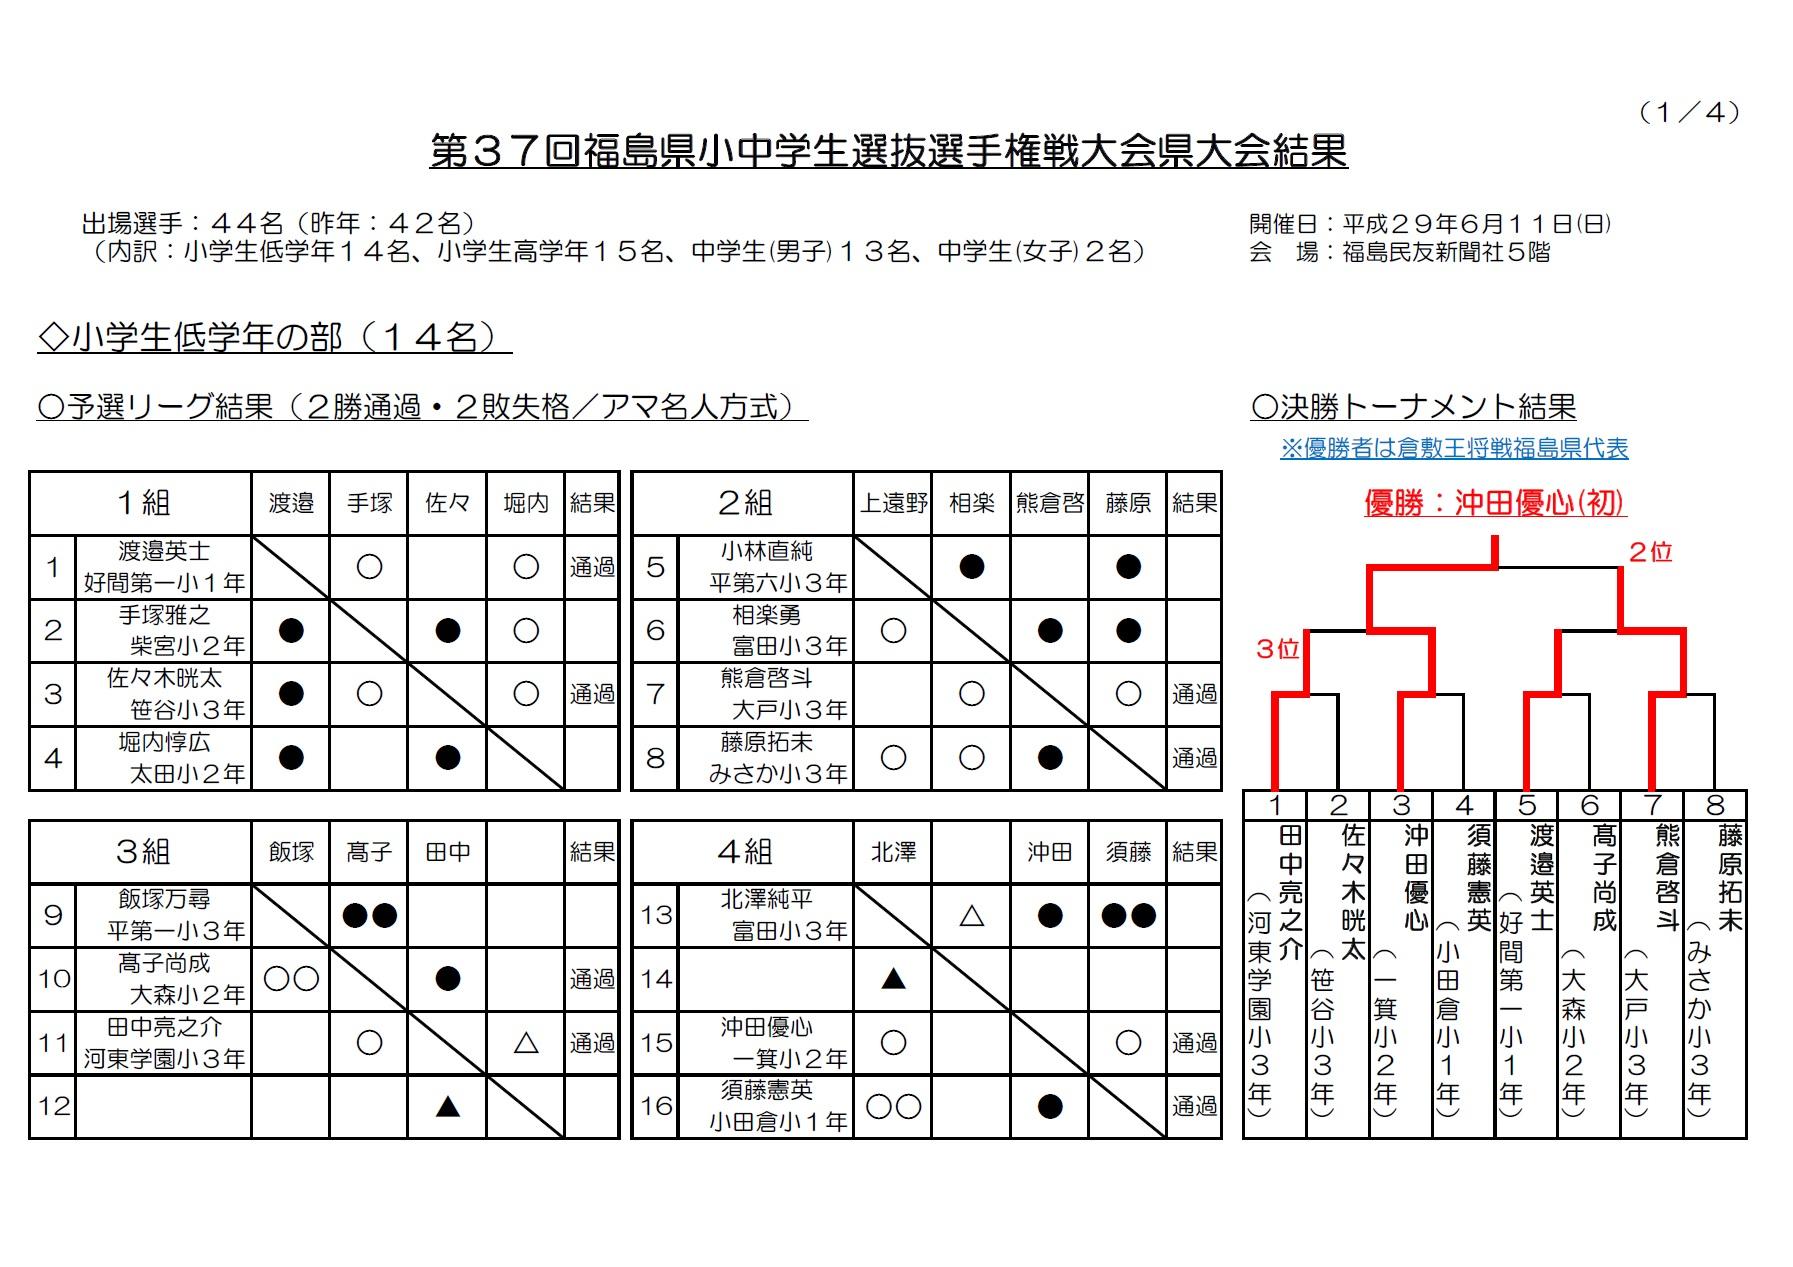 teigaku_20170611.jpg